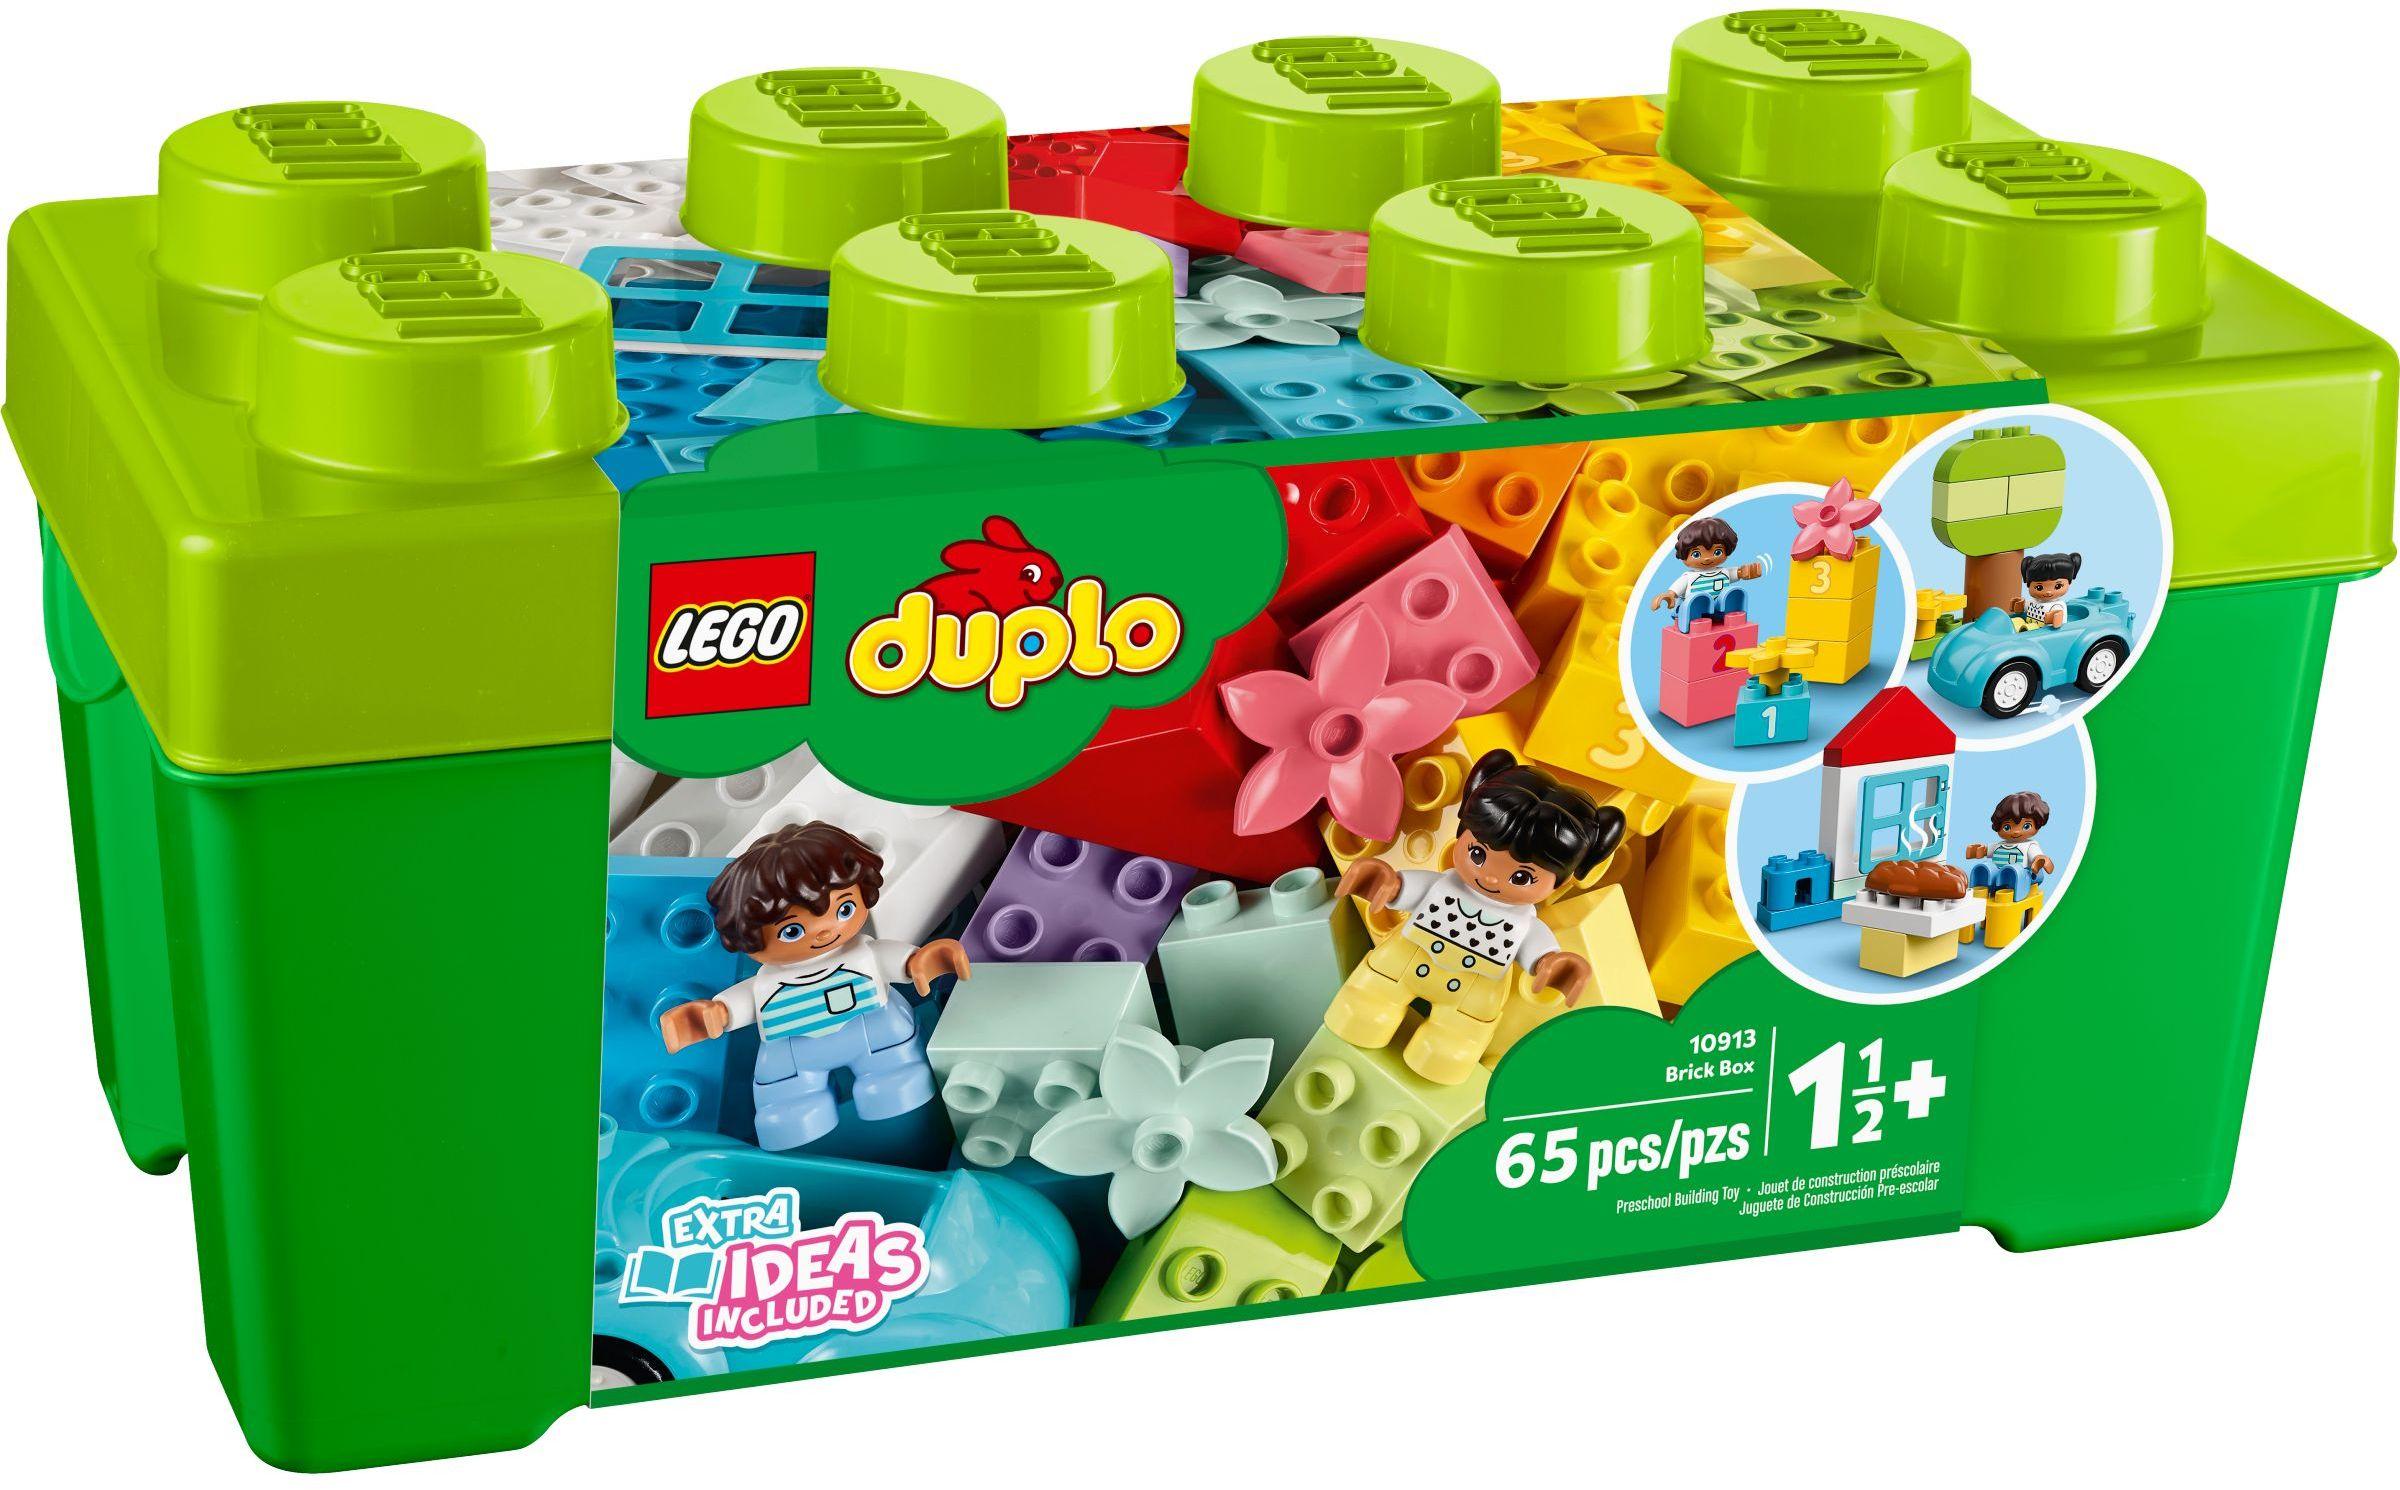 Lego Duplo 10913